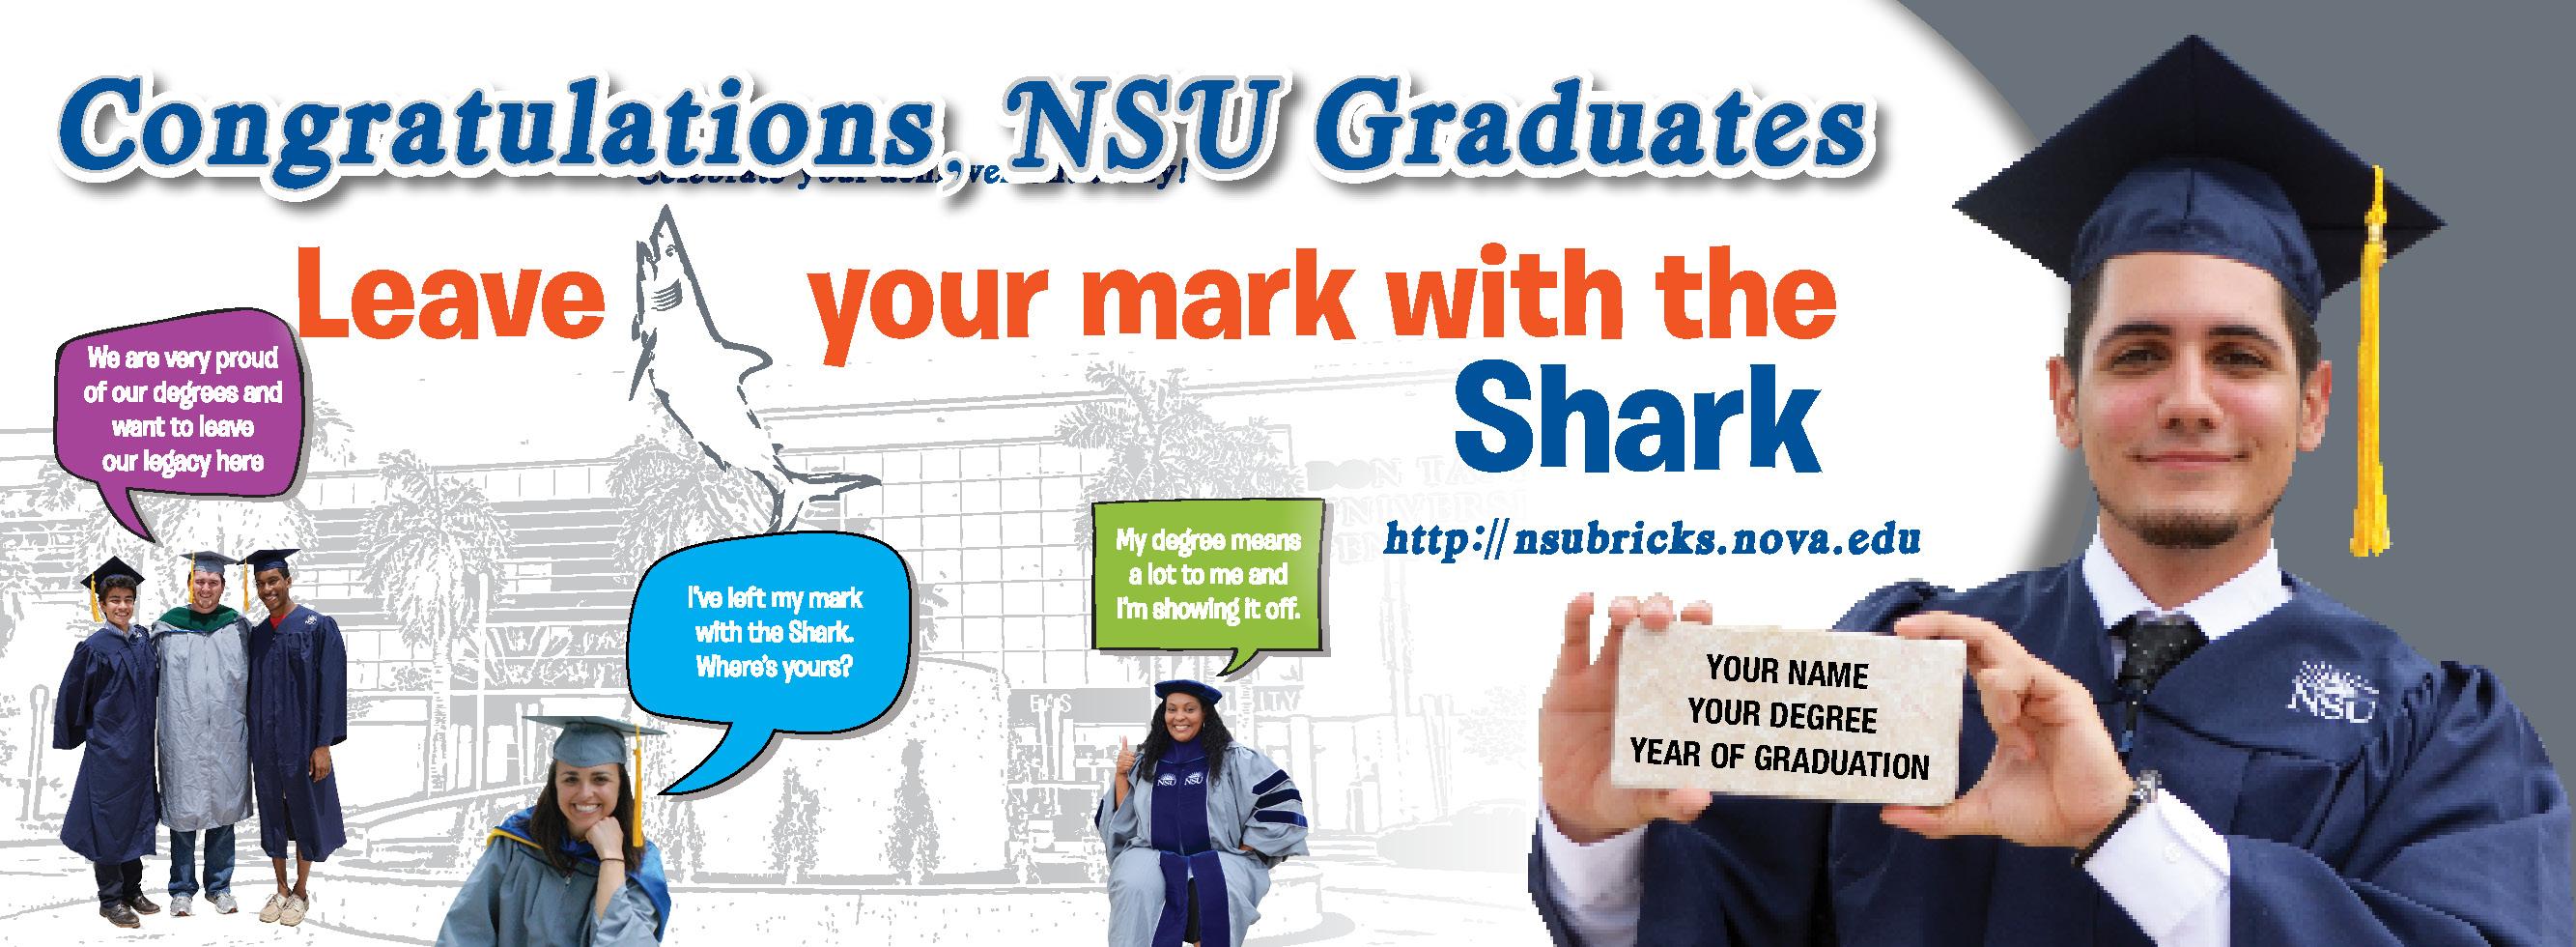 Congratulations, NSU Graduates!